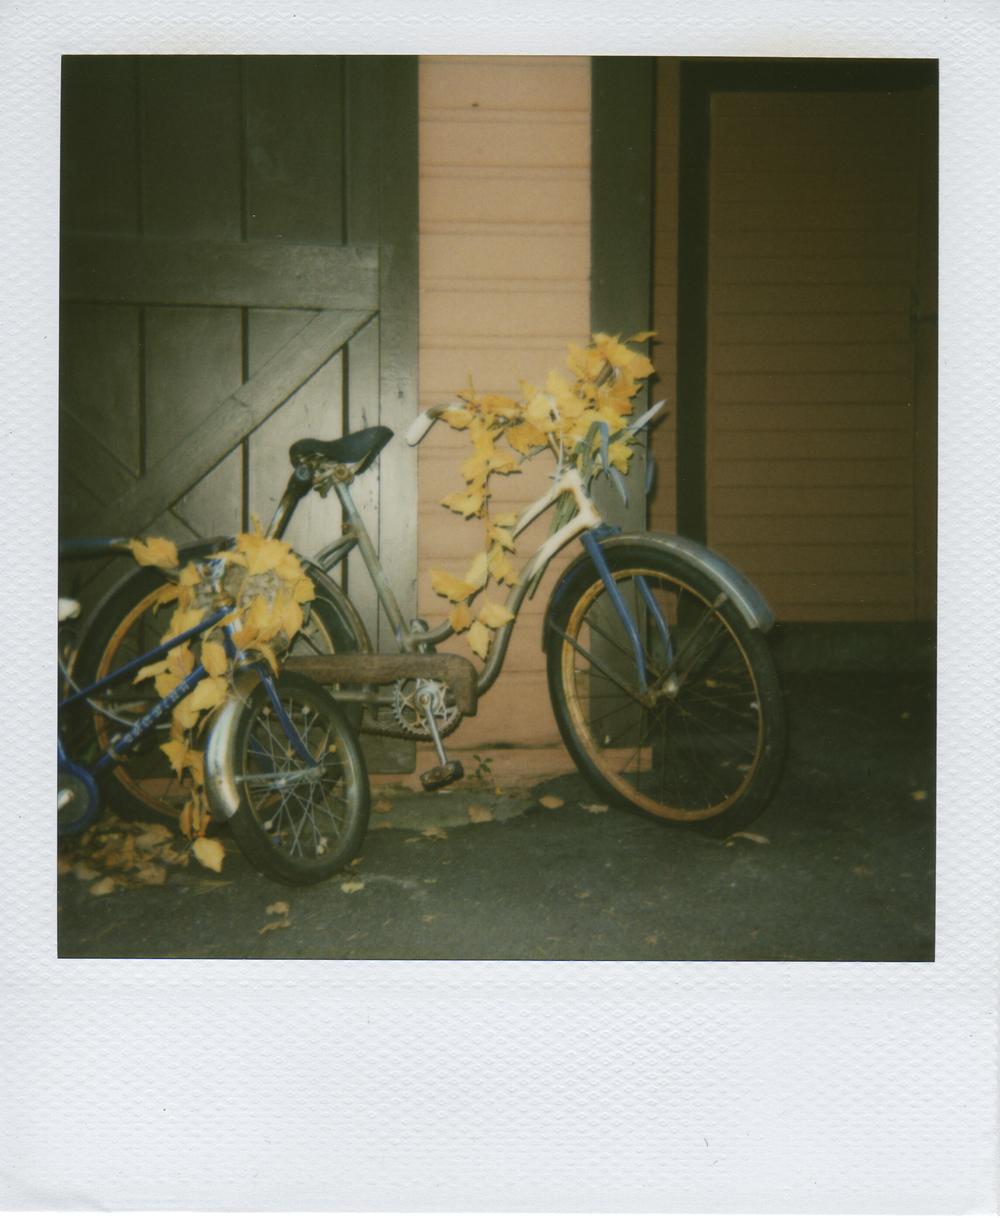 jlaurence-polaroid-104.jpg